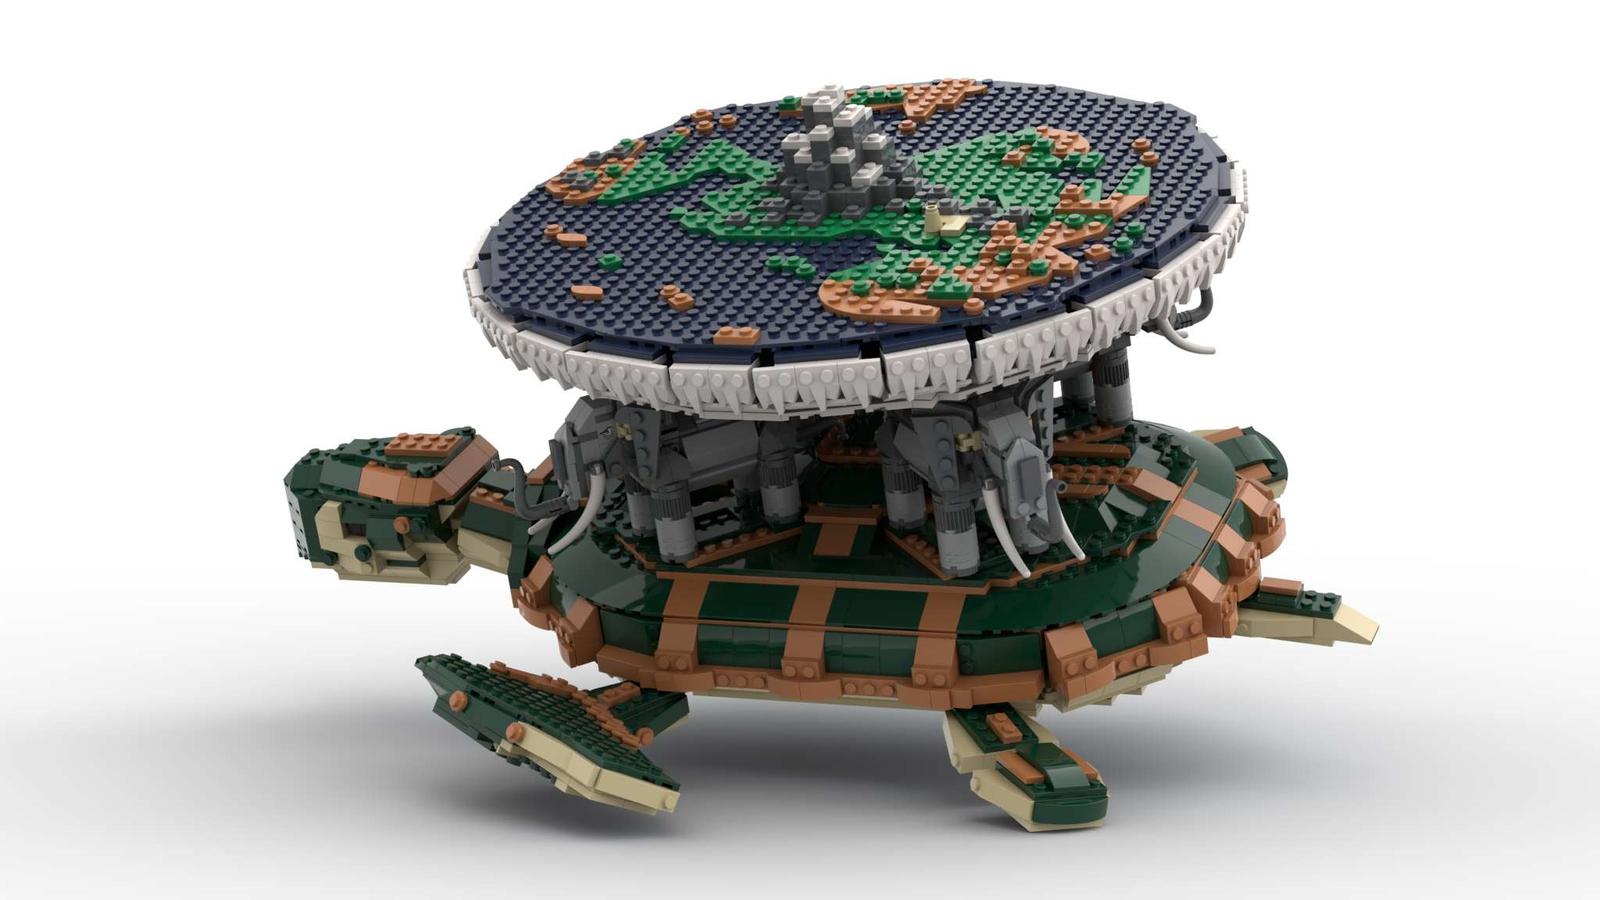 LEGO Ideas Terry Pratchett's Discworld